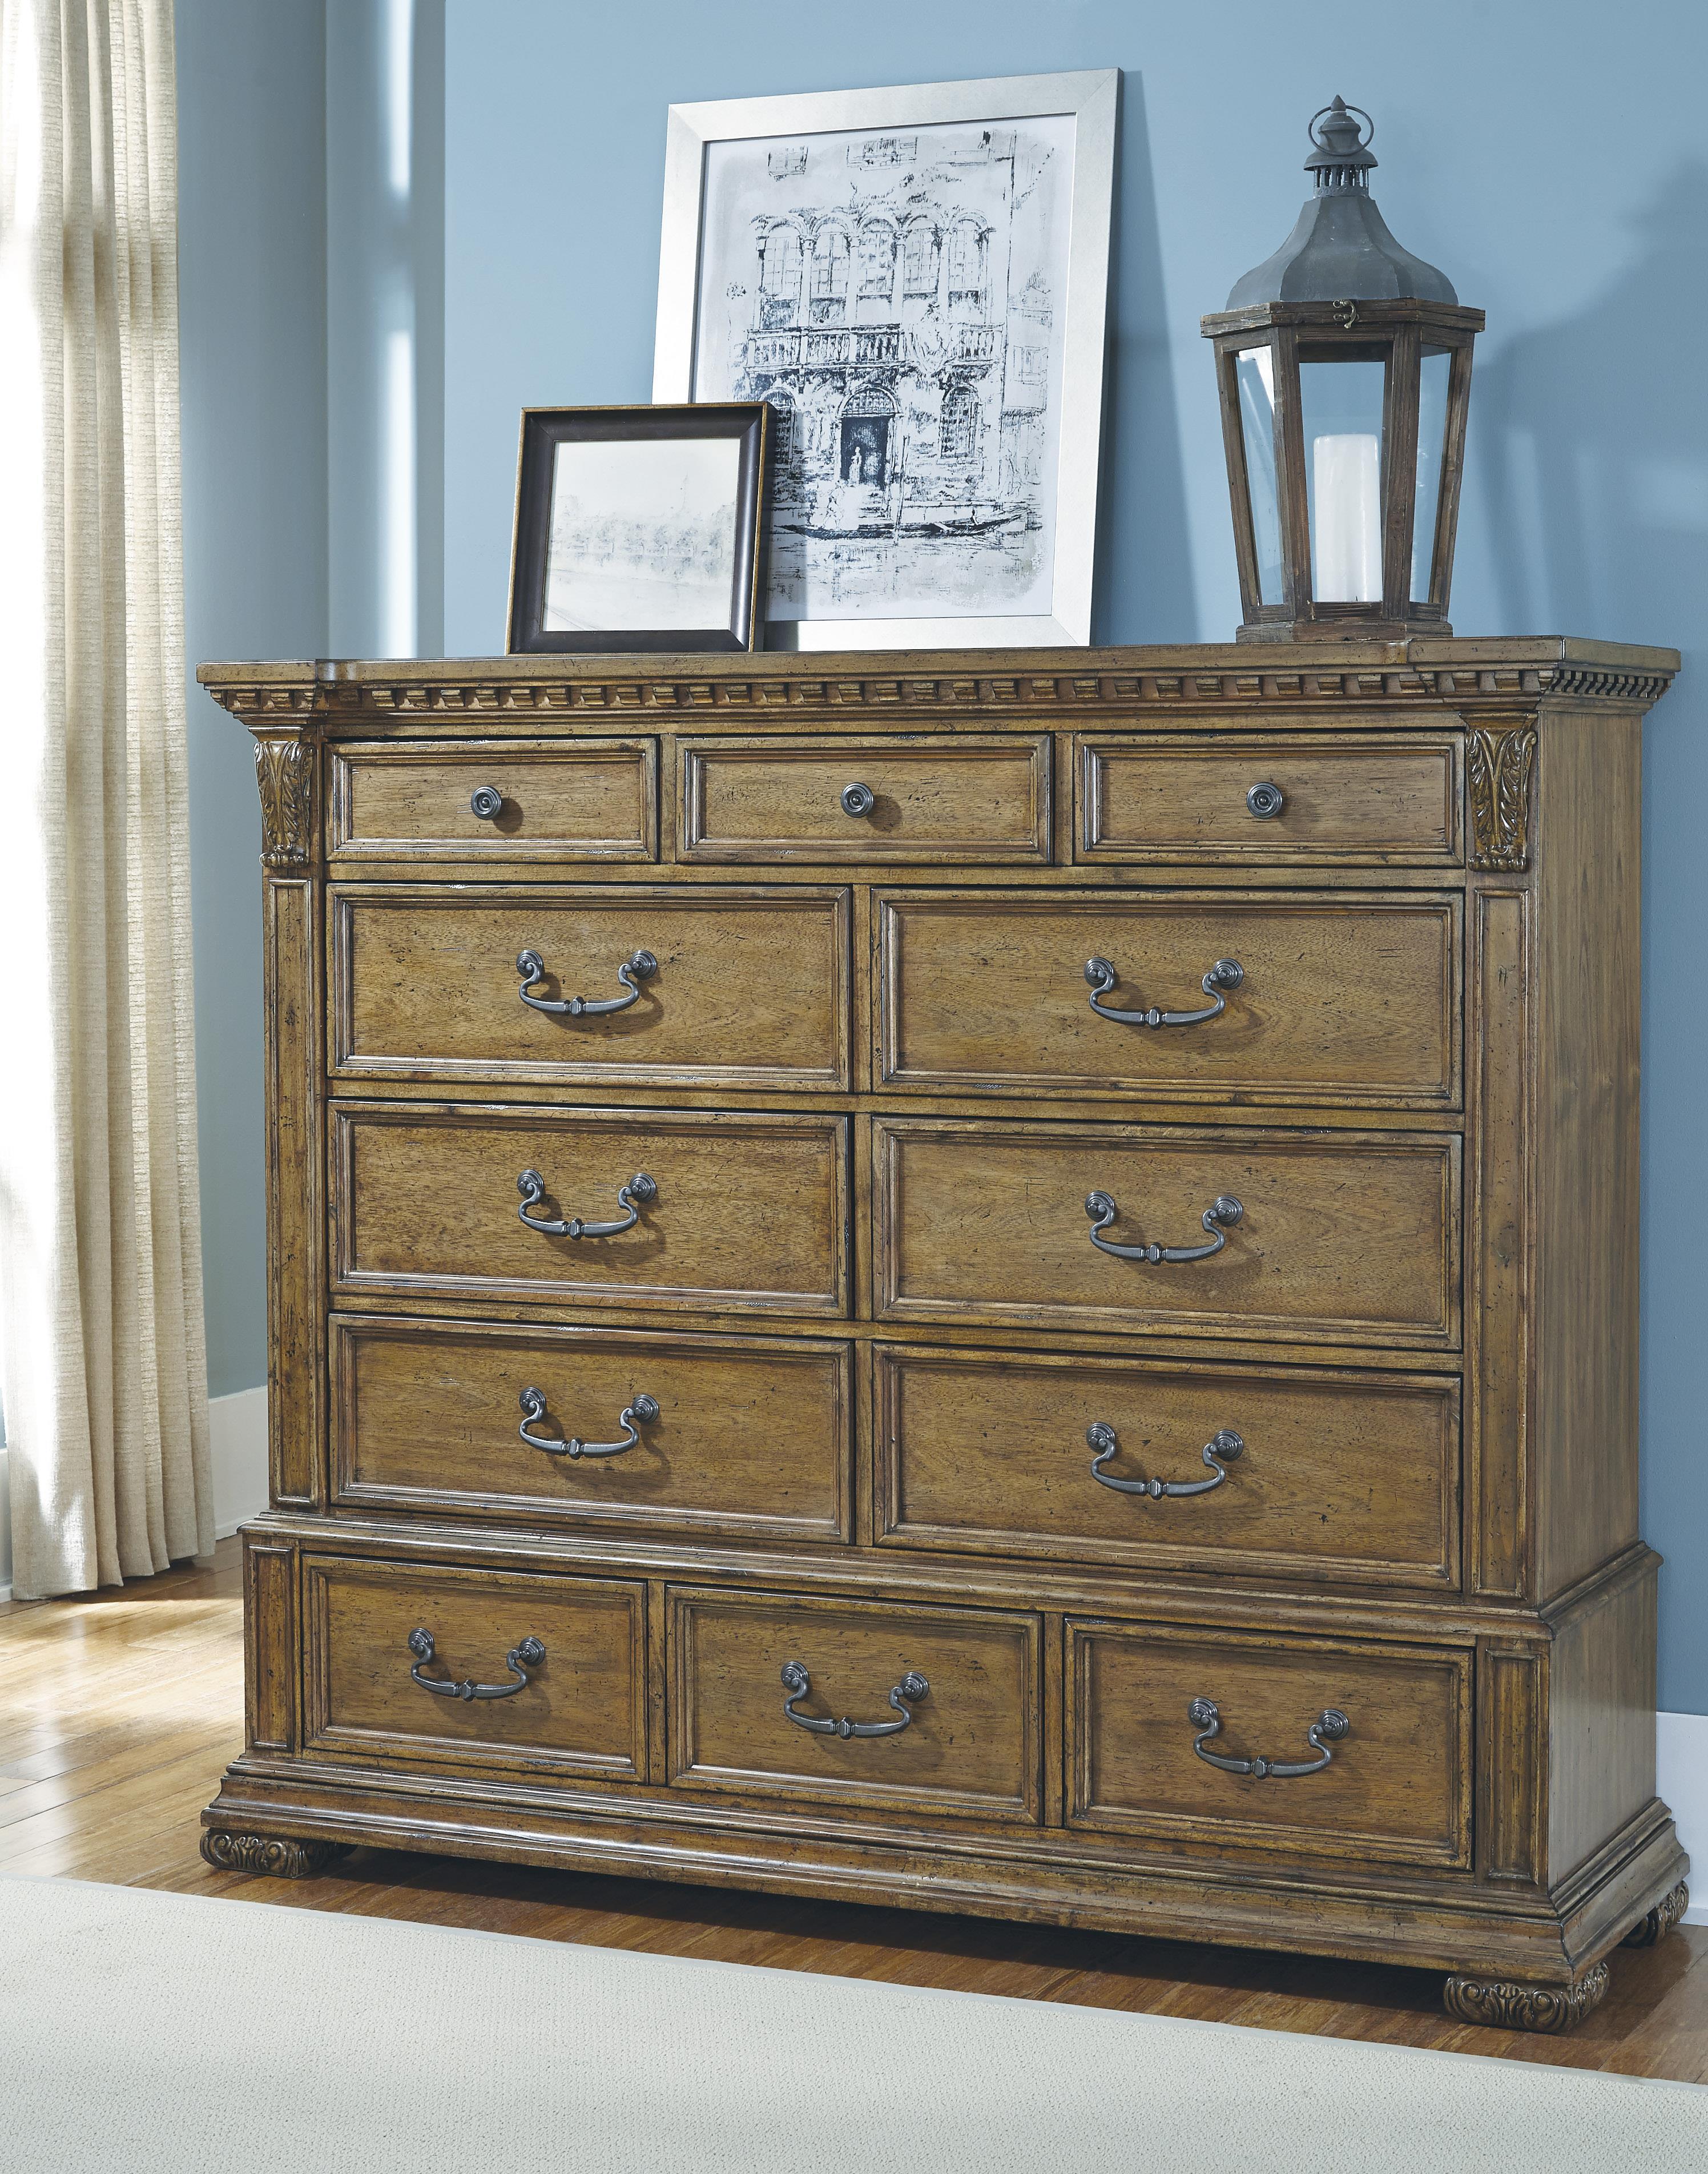 Pulaski Furniture Stratton 12 Drawer Master Chest Jacksonville Furniture Mart Chest Of Drawers